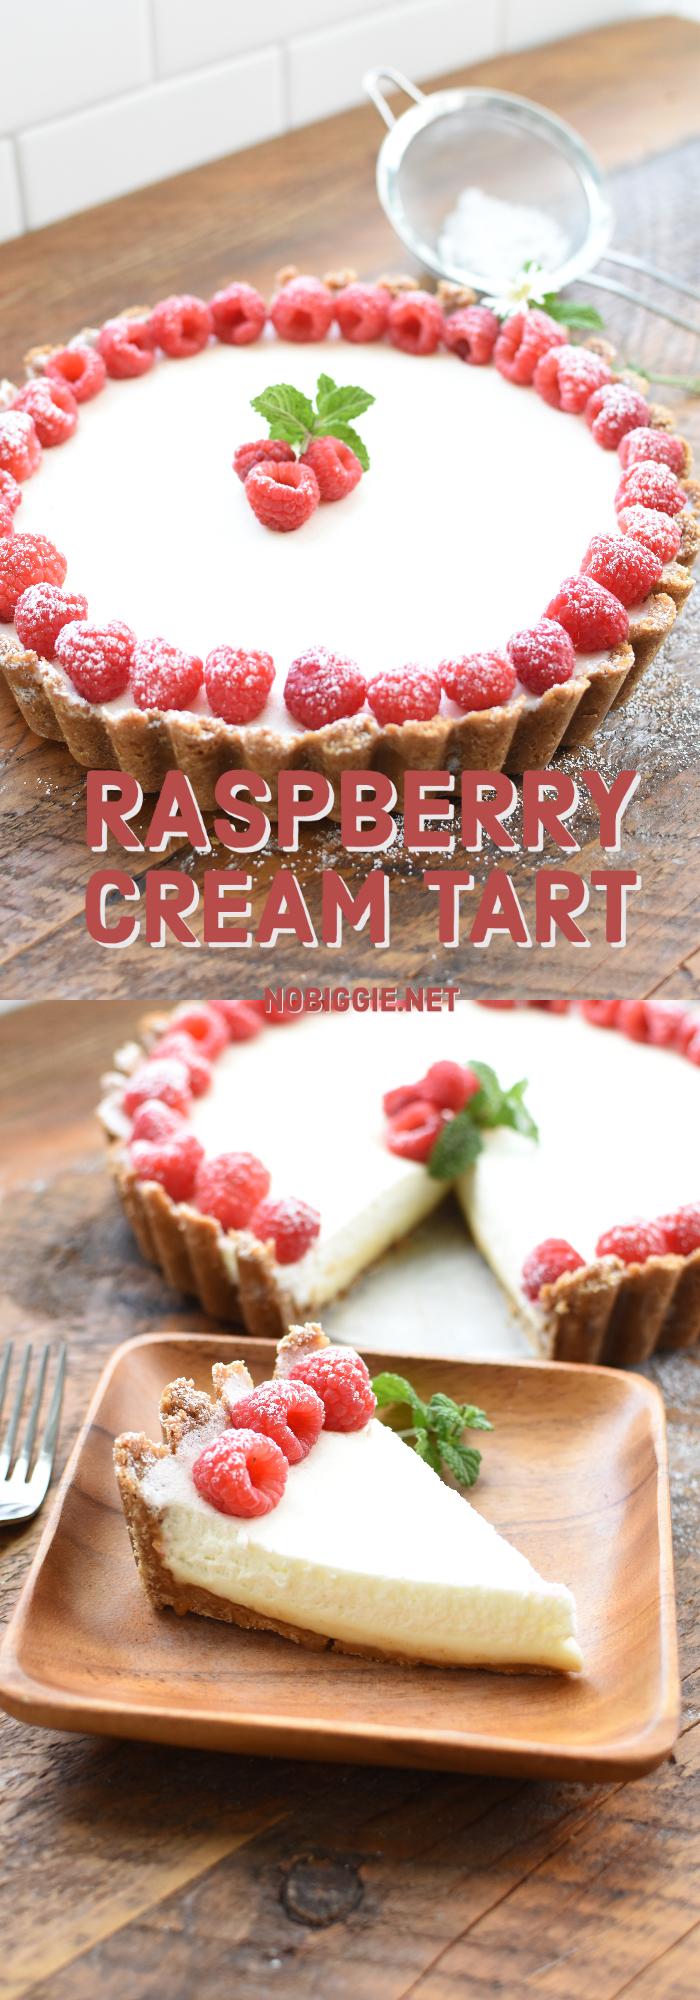 Raspberry Marshmallow Cream Tart | NoBiggie.net